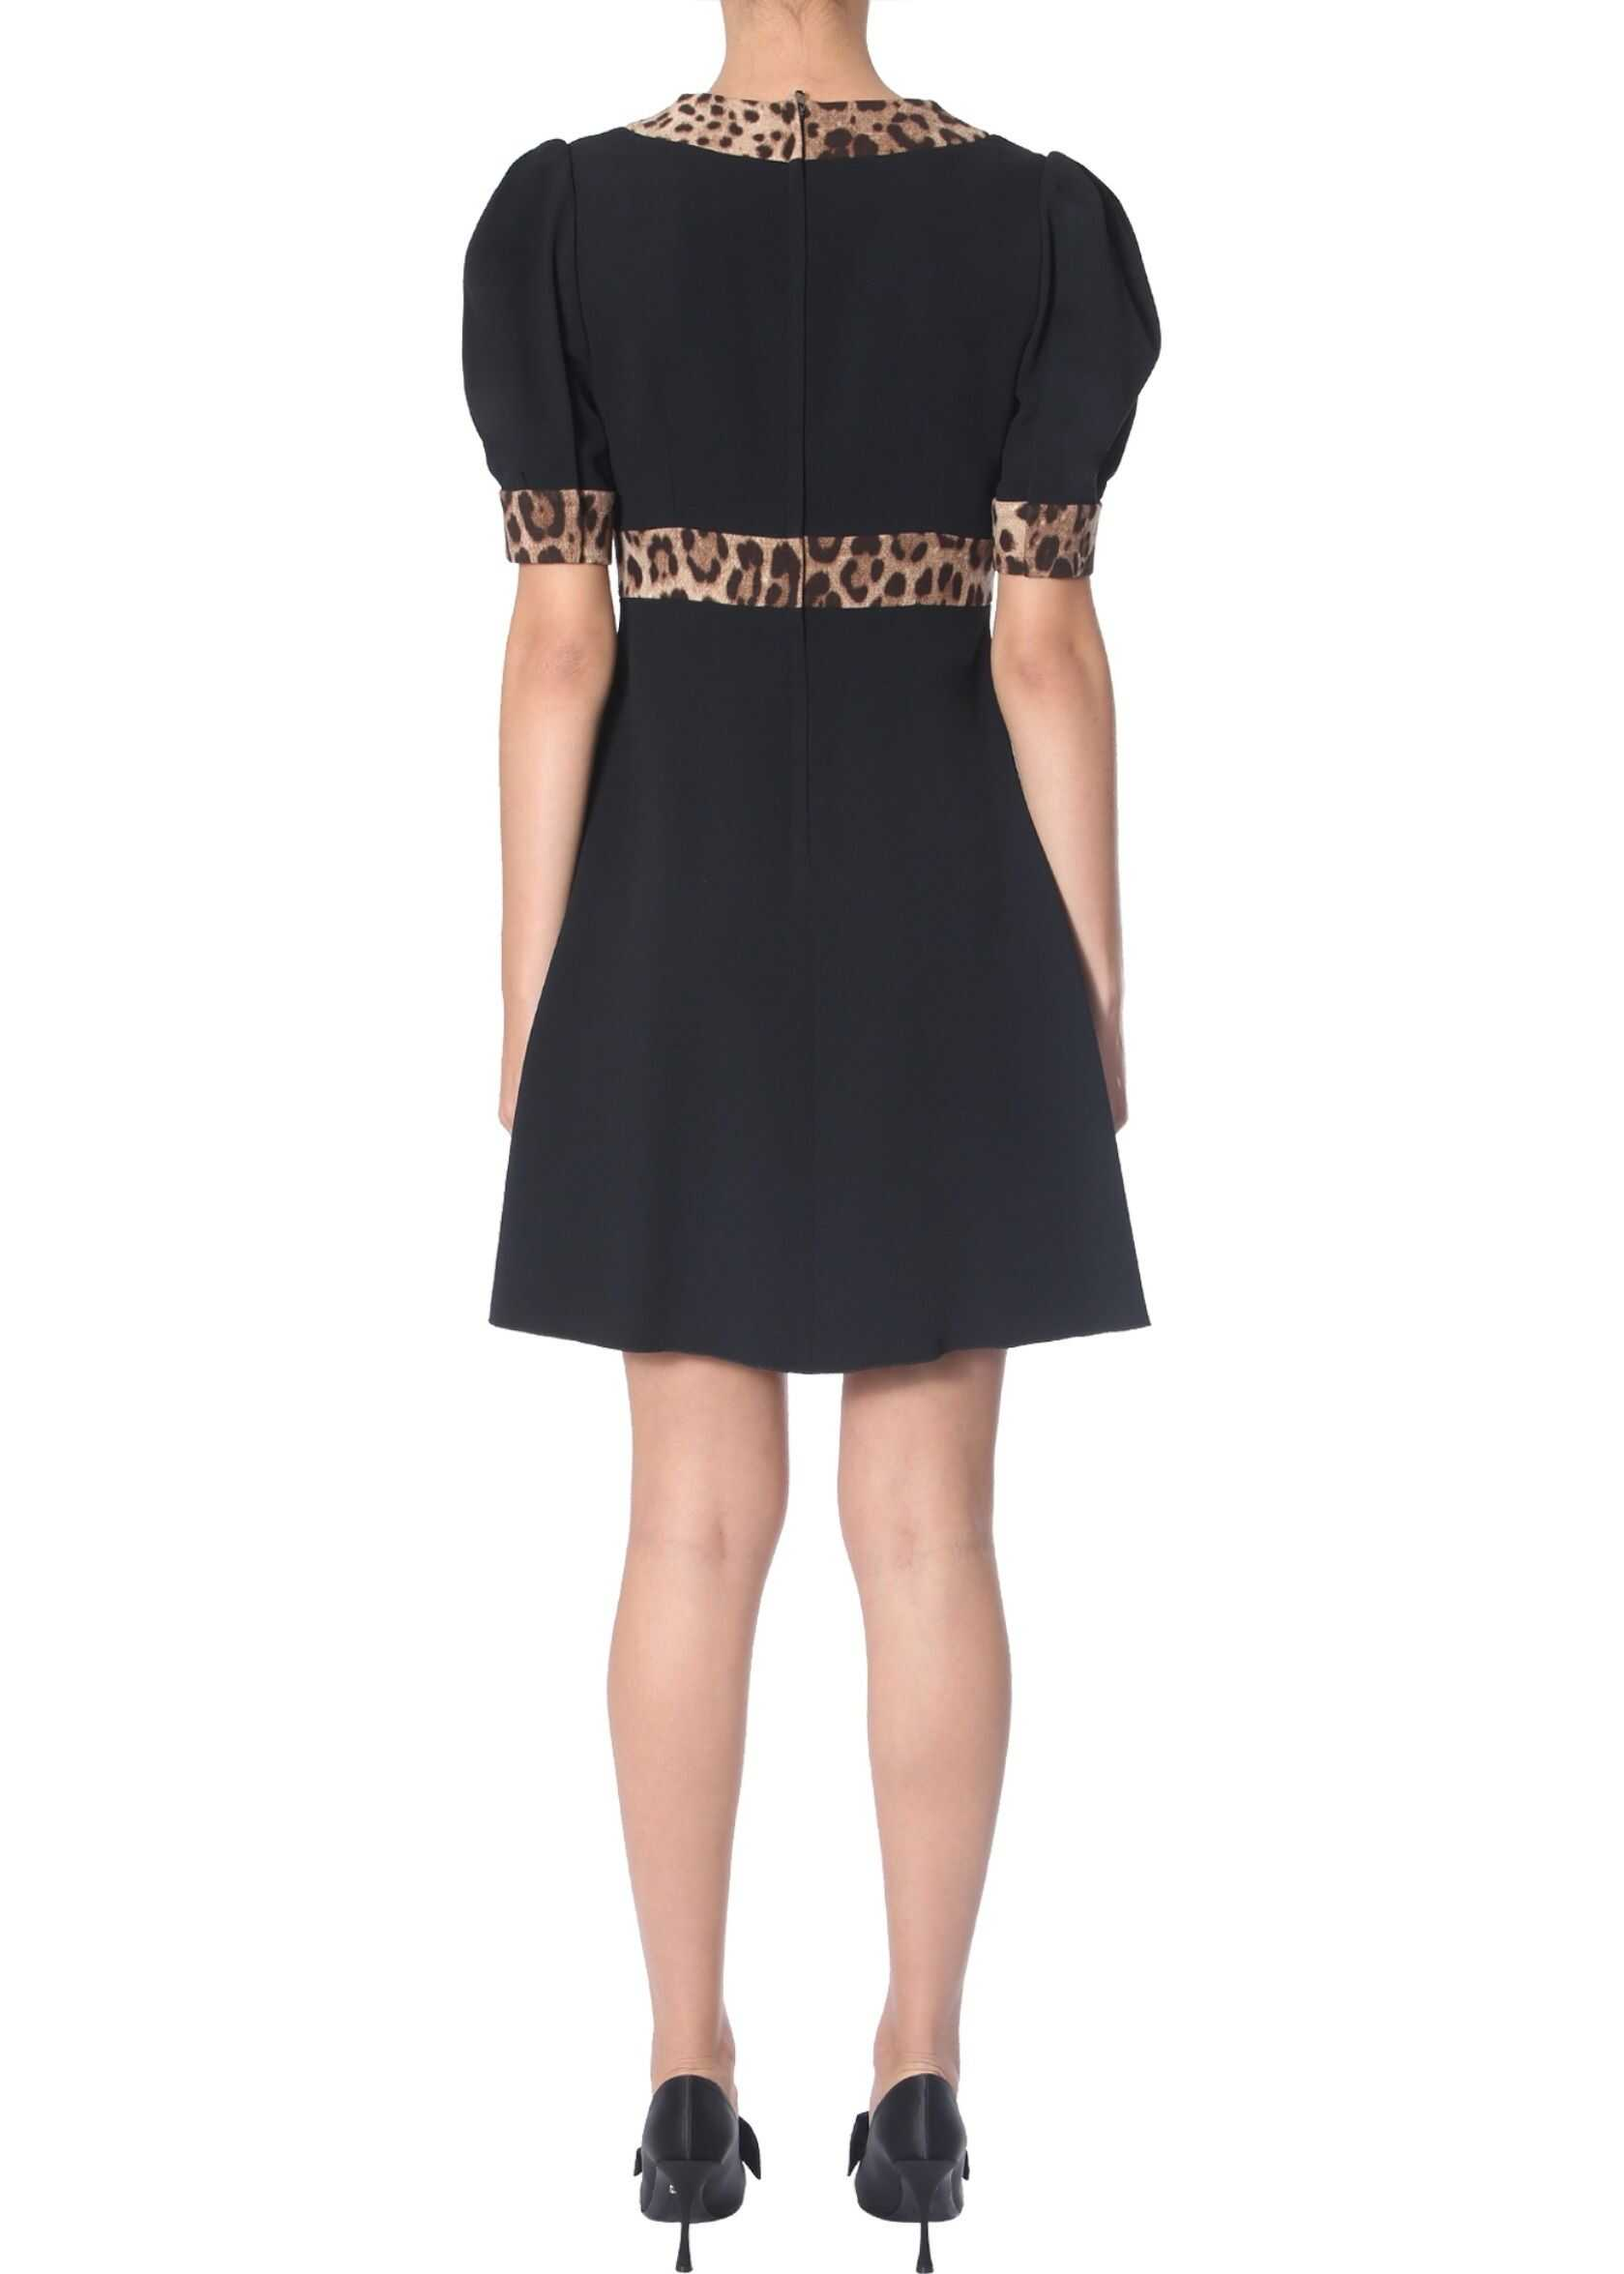 Dolce & Gabbana Short Dress BLACK